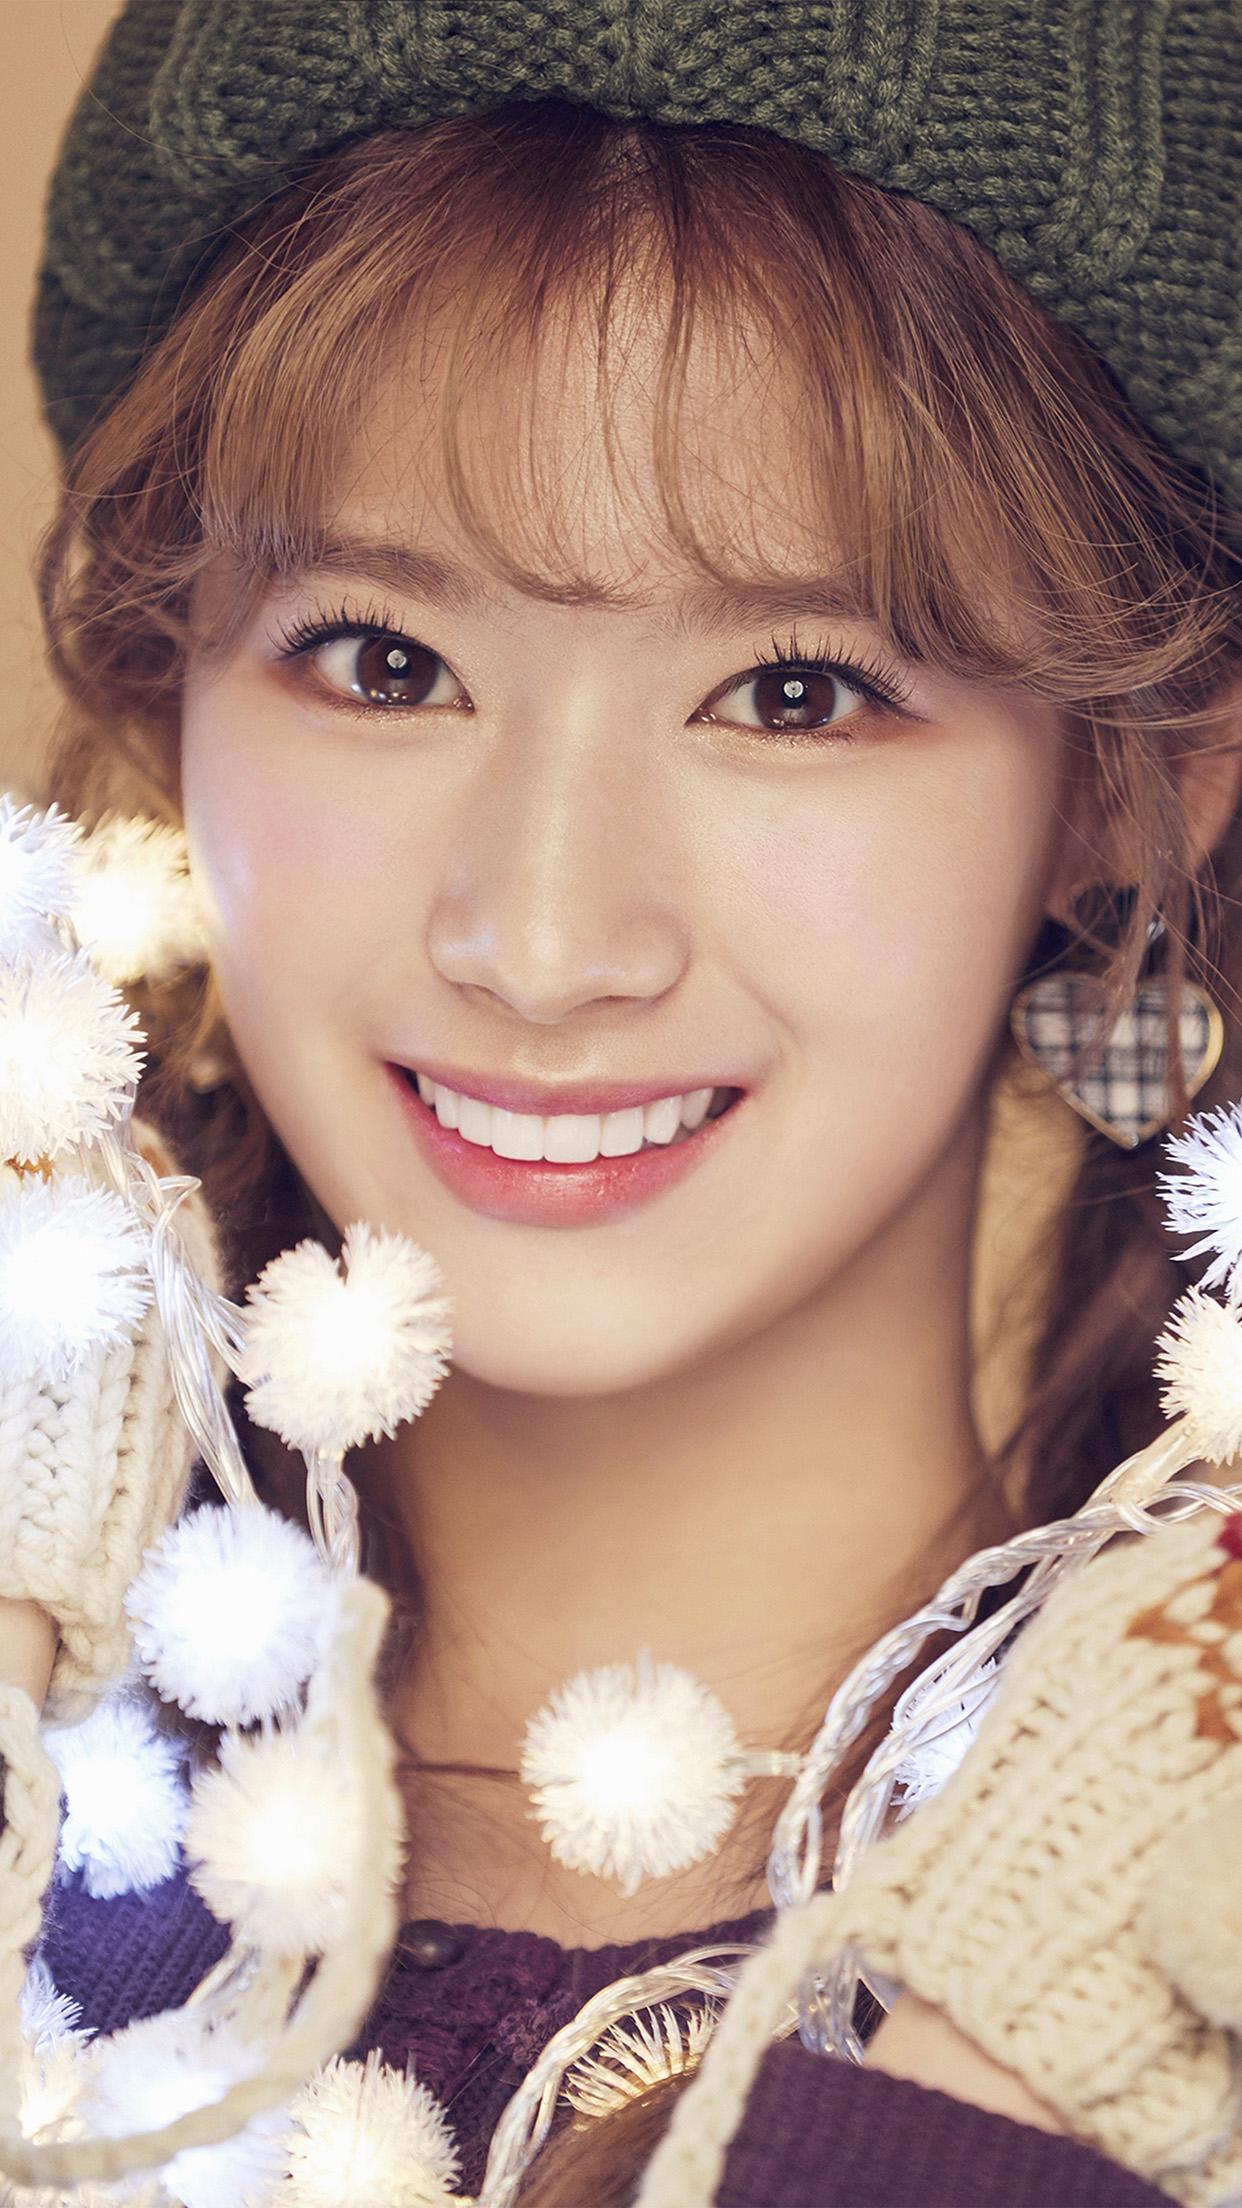 ho97-kpop-twice-sana-girl-asian-wallpaper